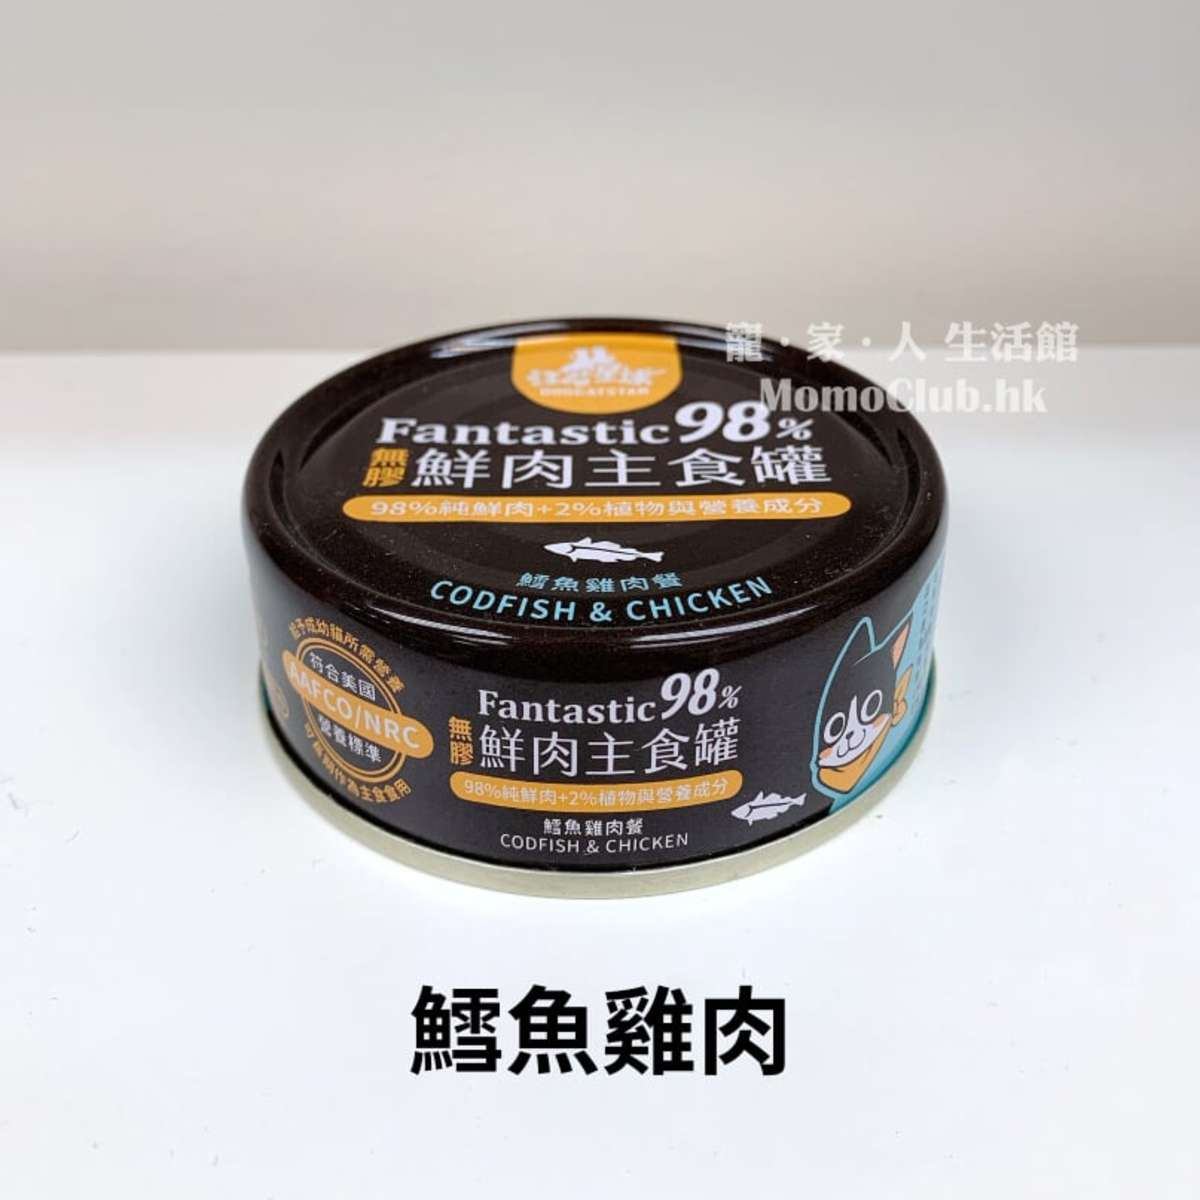 98% Fantastic 鮮肉主食罐 (鱈魚雞肉) 3罐, 80g x 3